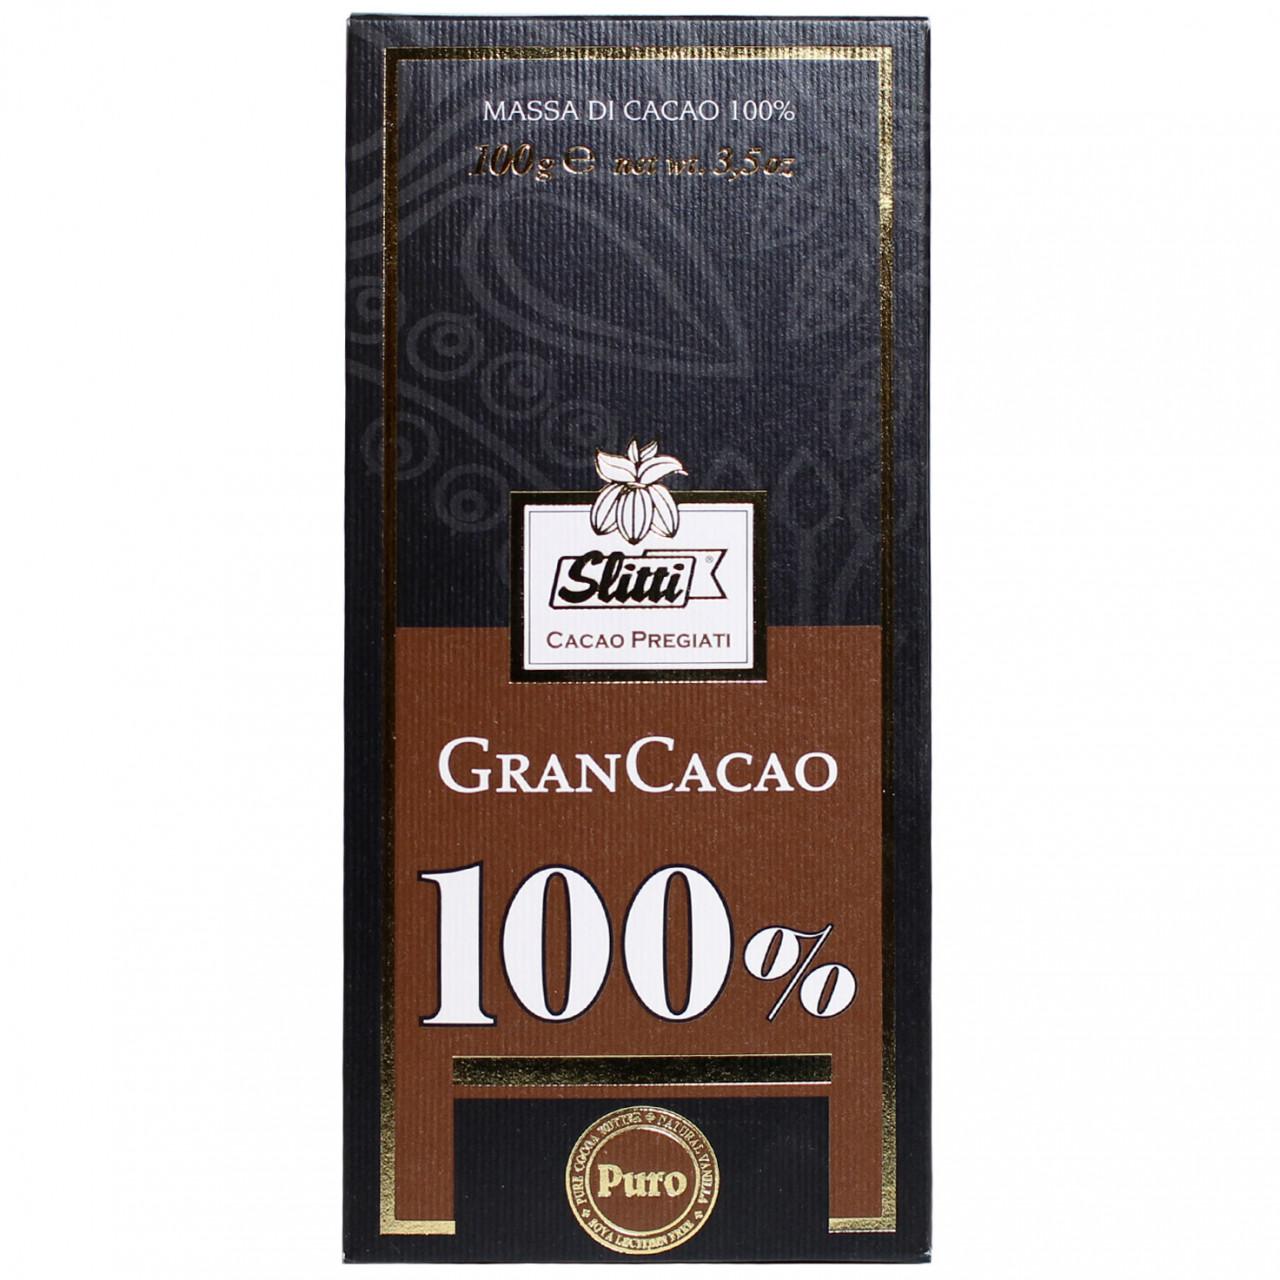 dark chocolate, cocoa mass, chocolat noir pure, Italien, Italia, cioccolato fondente extra, extra bitter chocolate, chocolat noir, Zartbitterschokolade, lezithinfrei, lecithinfrei, Tuscany, Toskana,